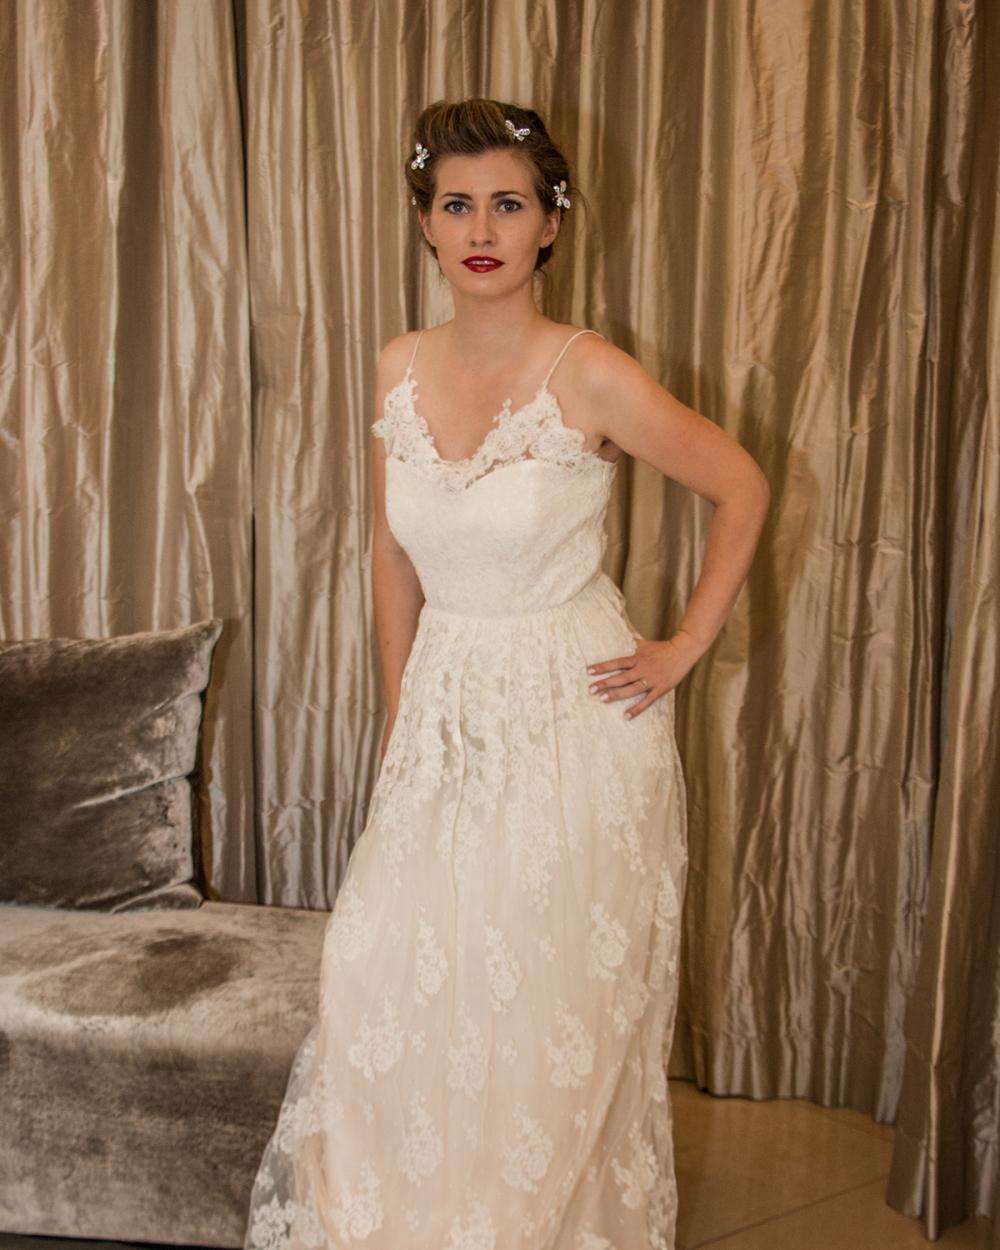 Bridal Look Romantic BineLovesLife